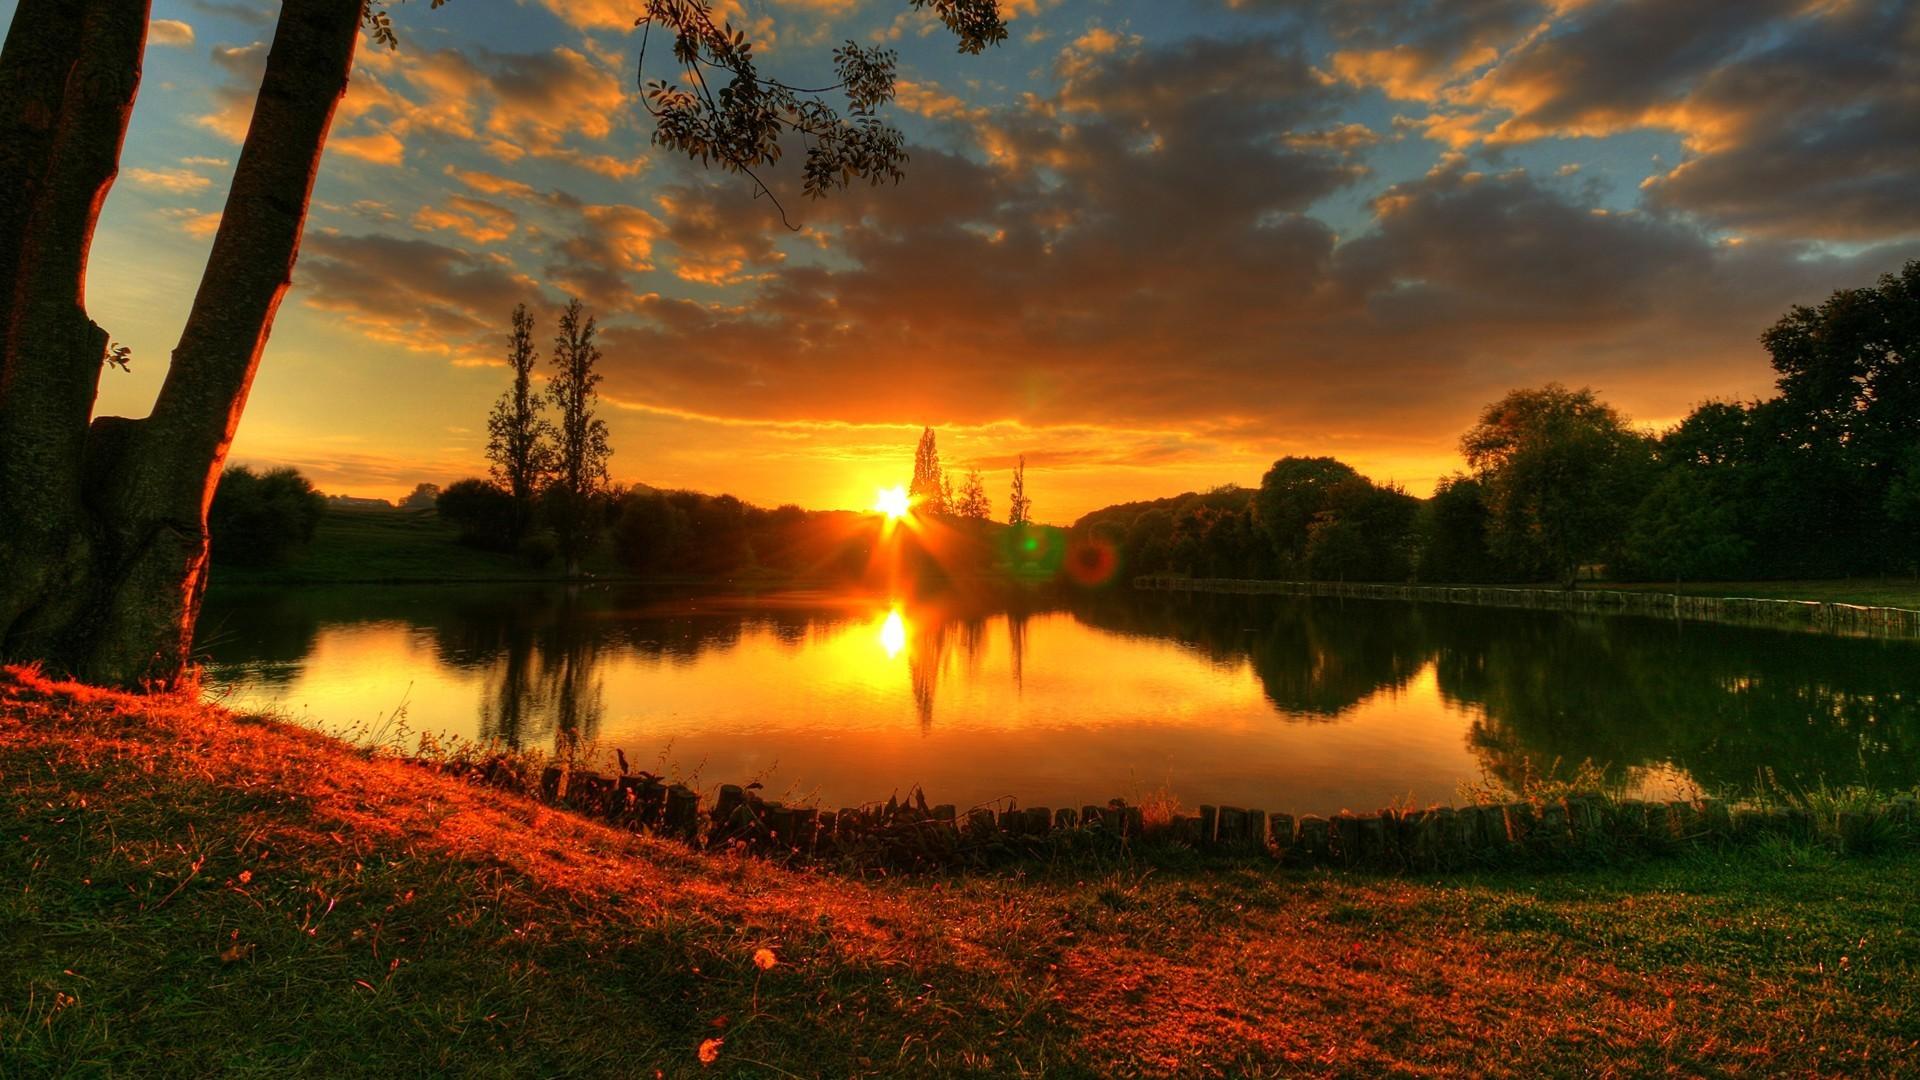 яркий закат над деревьями смотреть